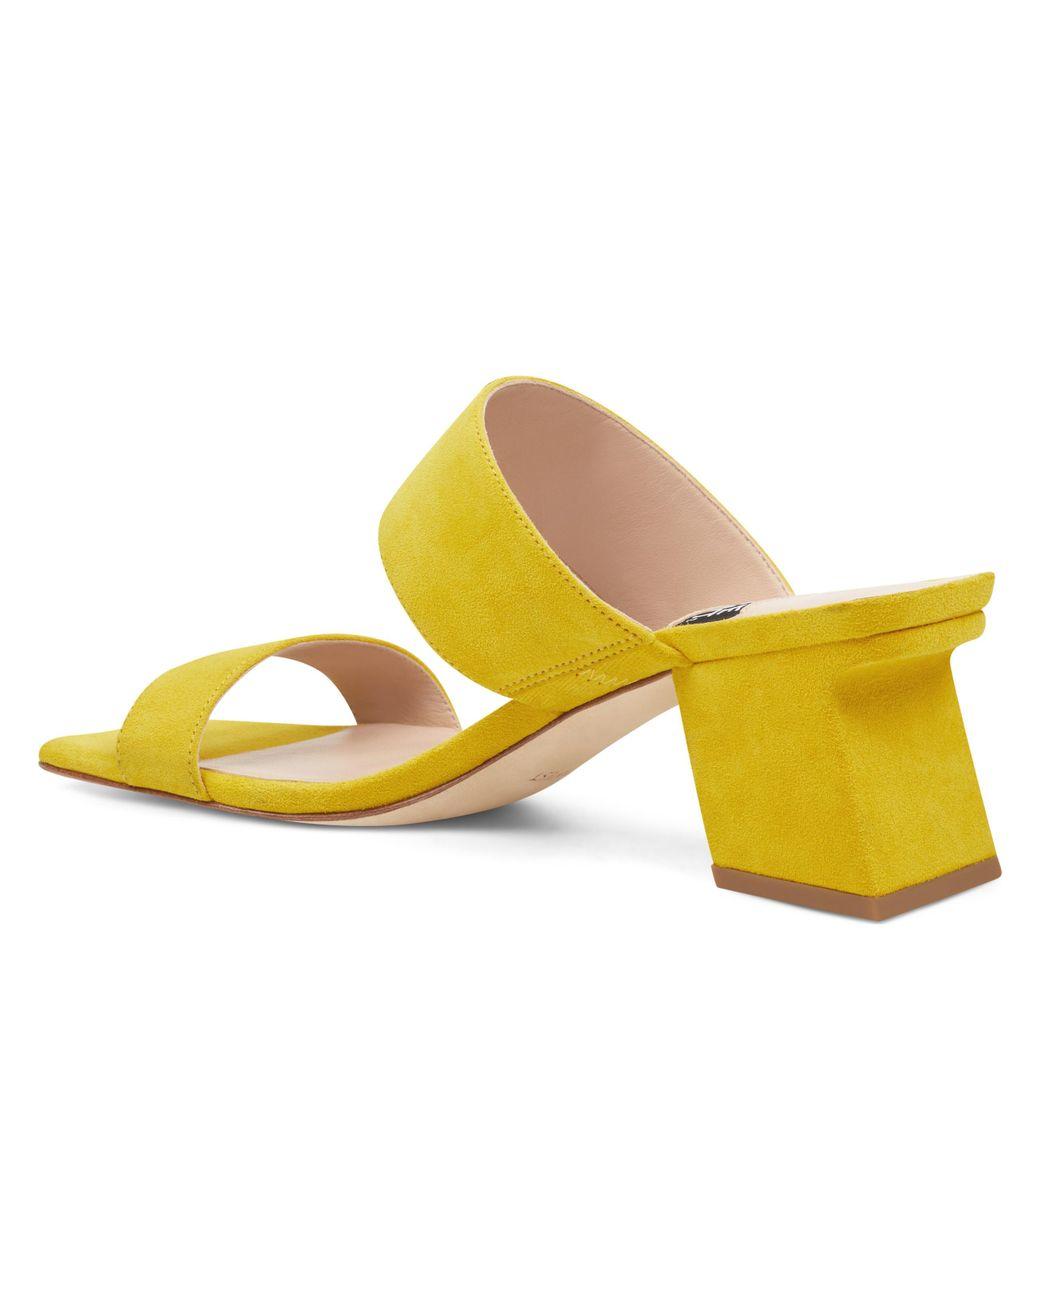 5134b99b0dcd Lyst - Nine West Churen Double Strap Mule Sandals in Yellow - Save 34%